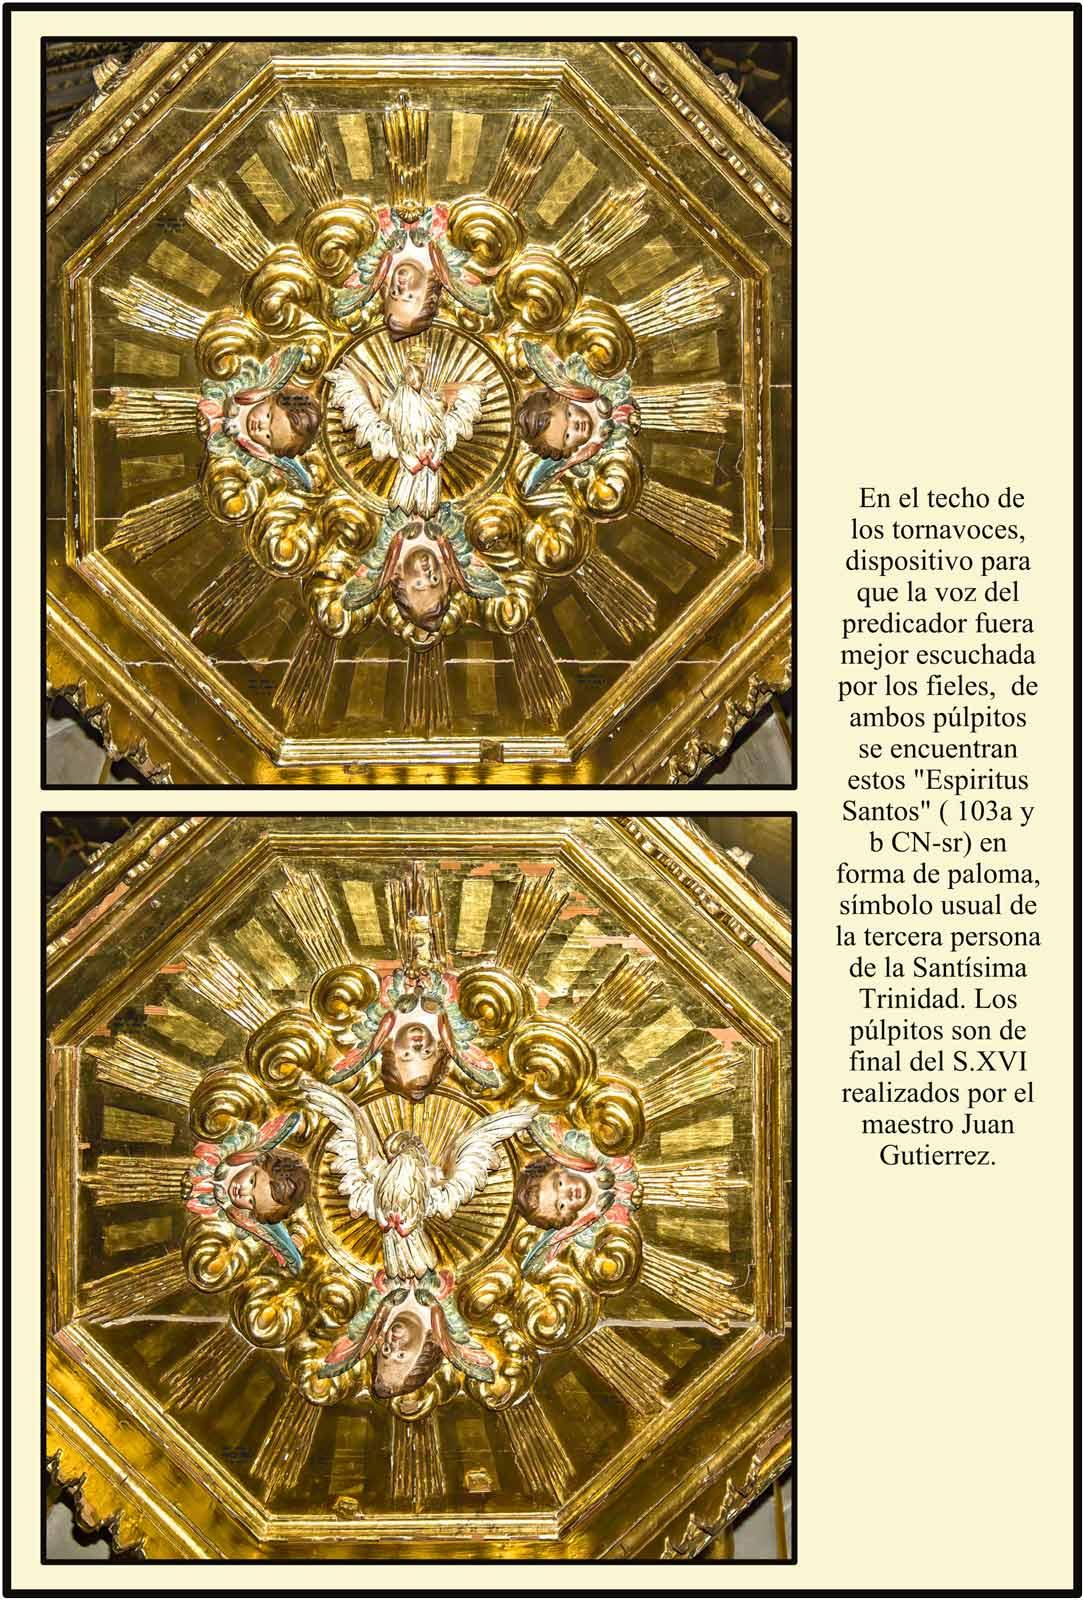 Tornavoz pulpitos Catedral Plassencia